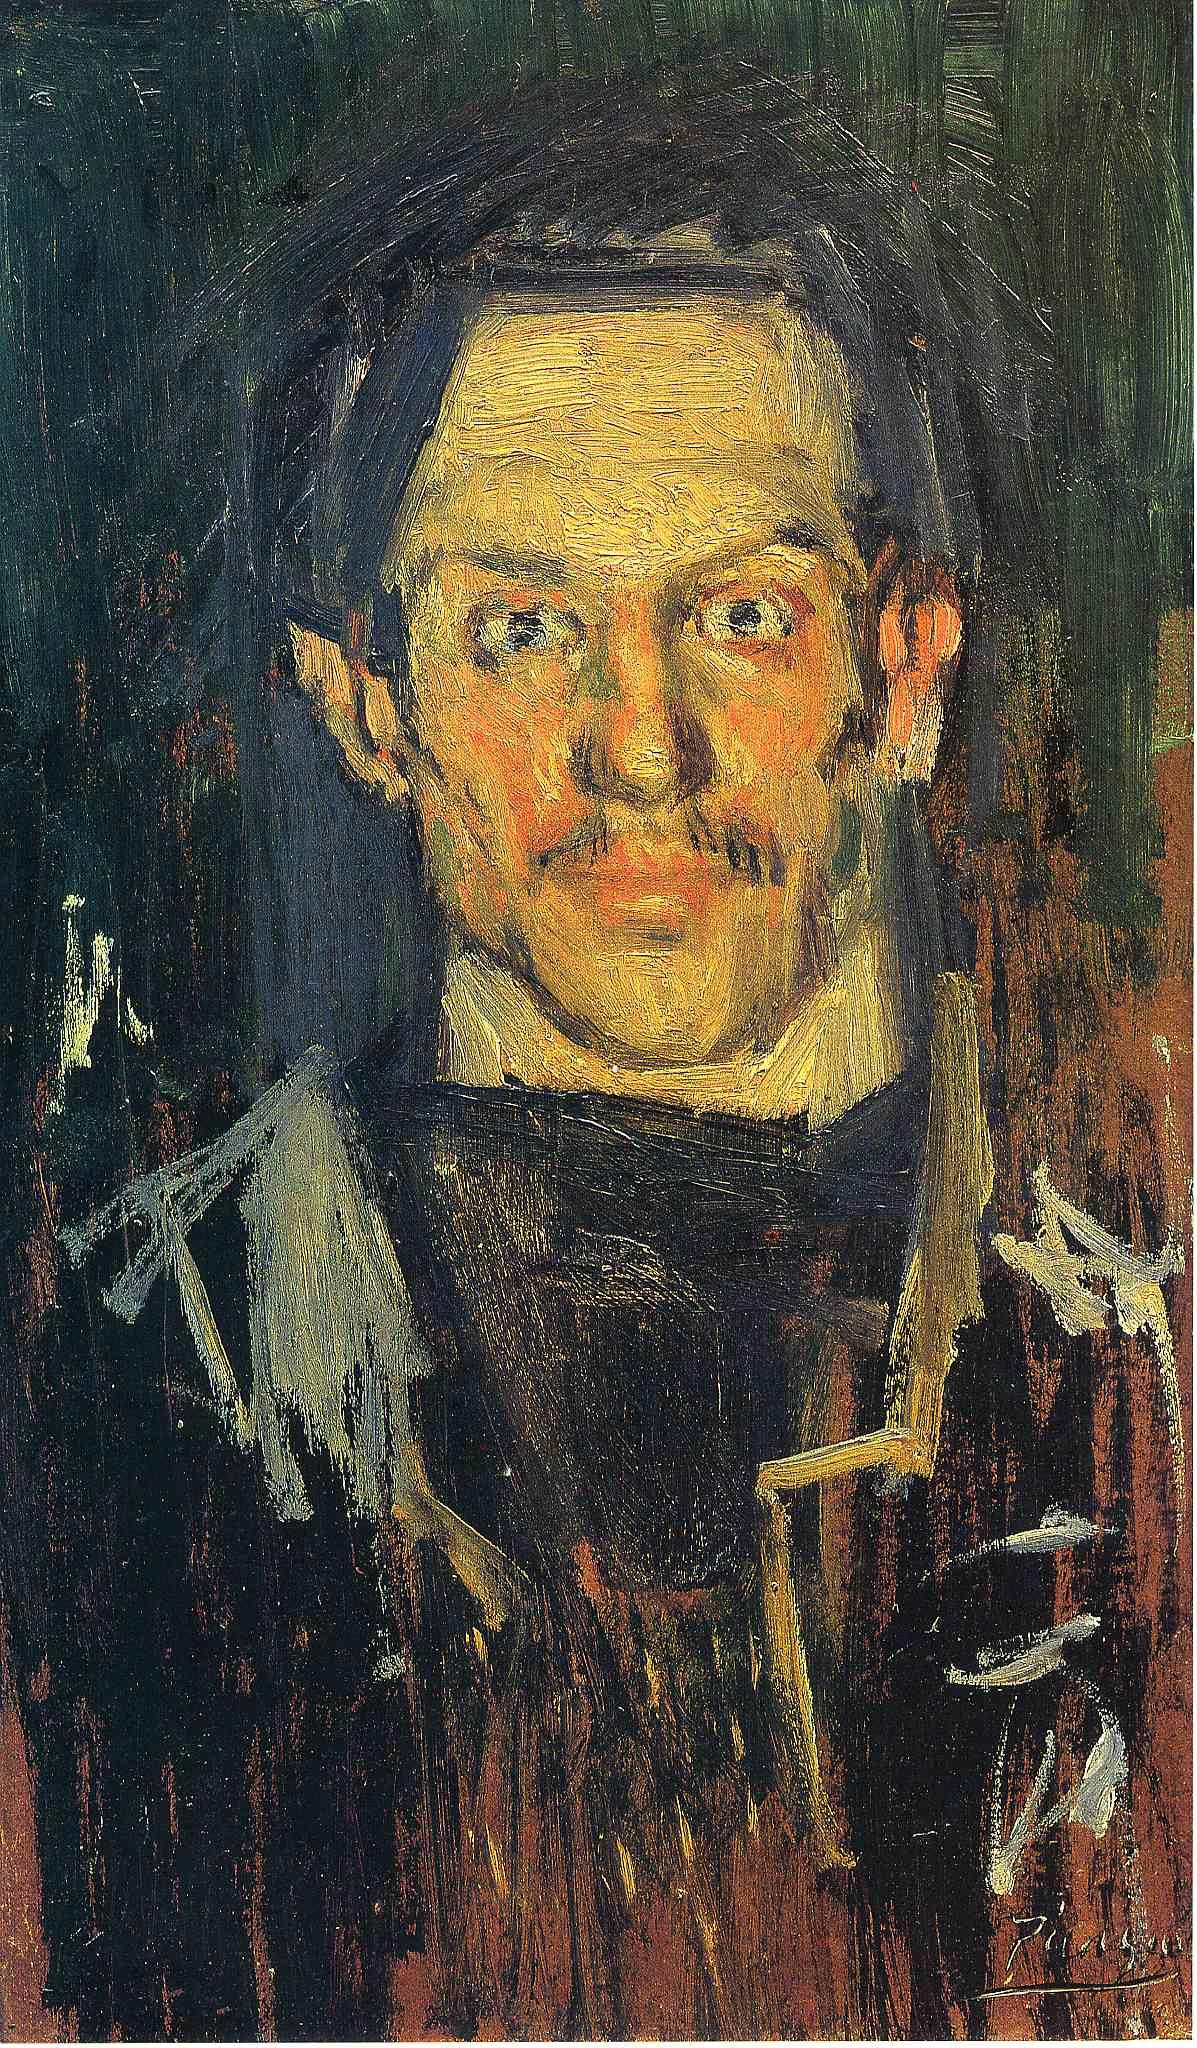 Self-Portrait - Pablo Picasso - WikiArt.org - encyclopedia ...